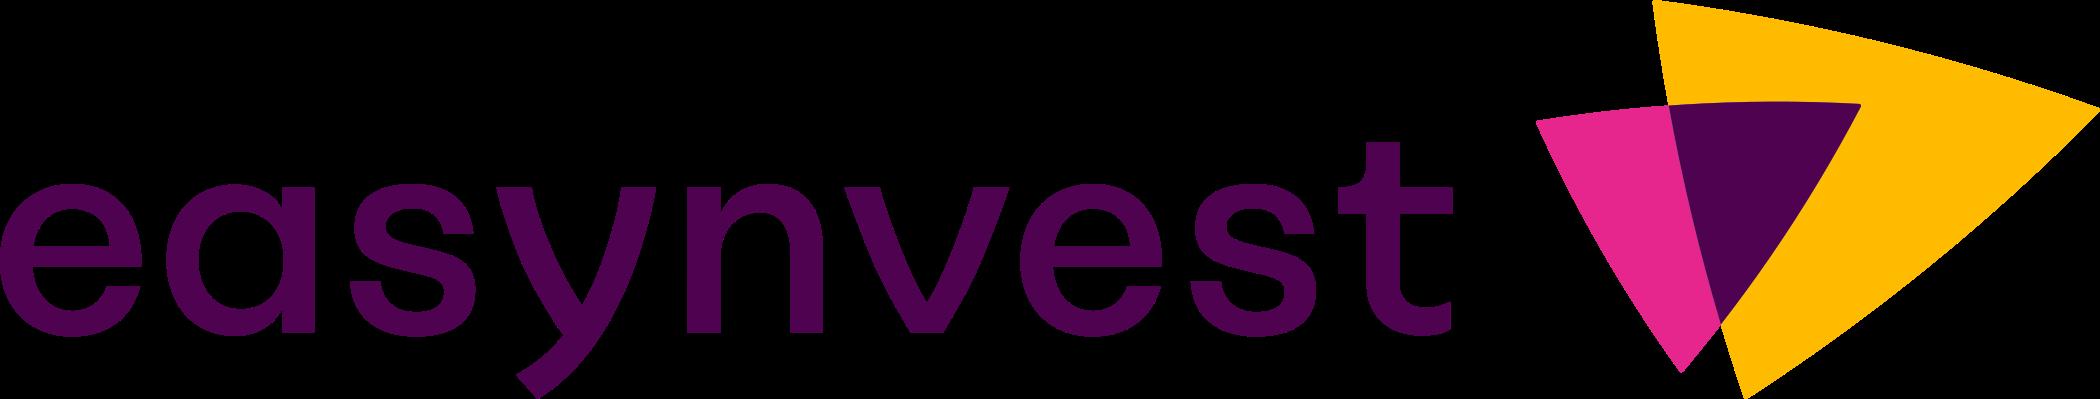 easynvest logo 1 - Easynvest Logo